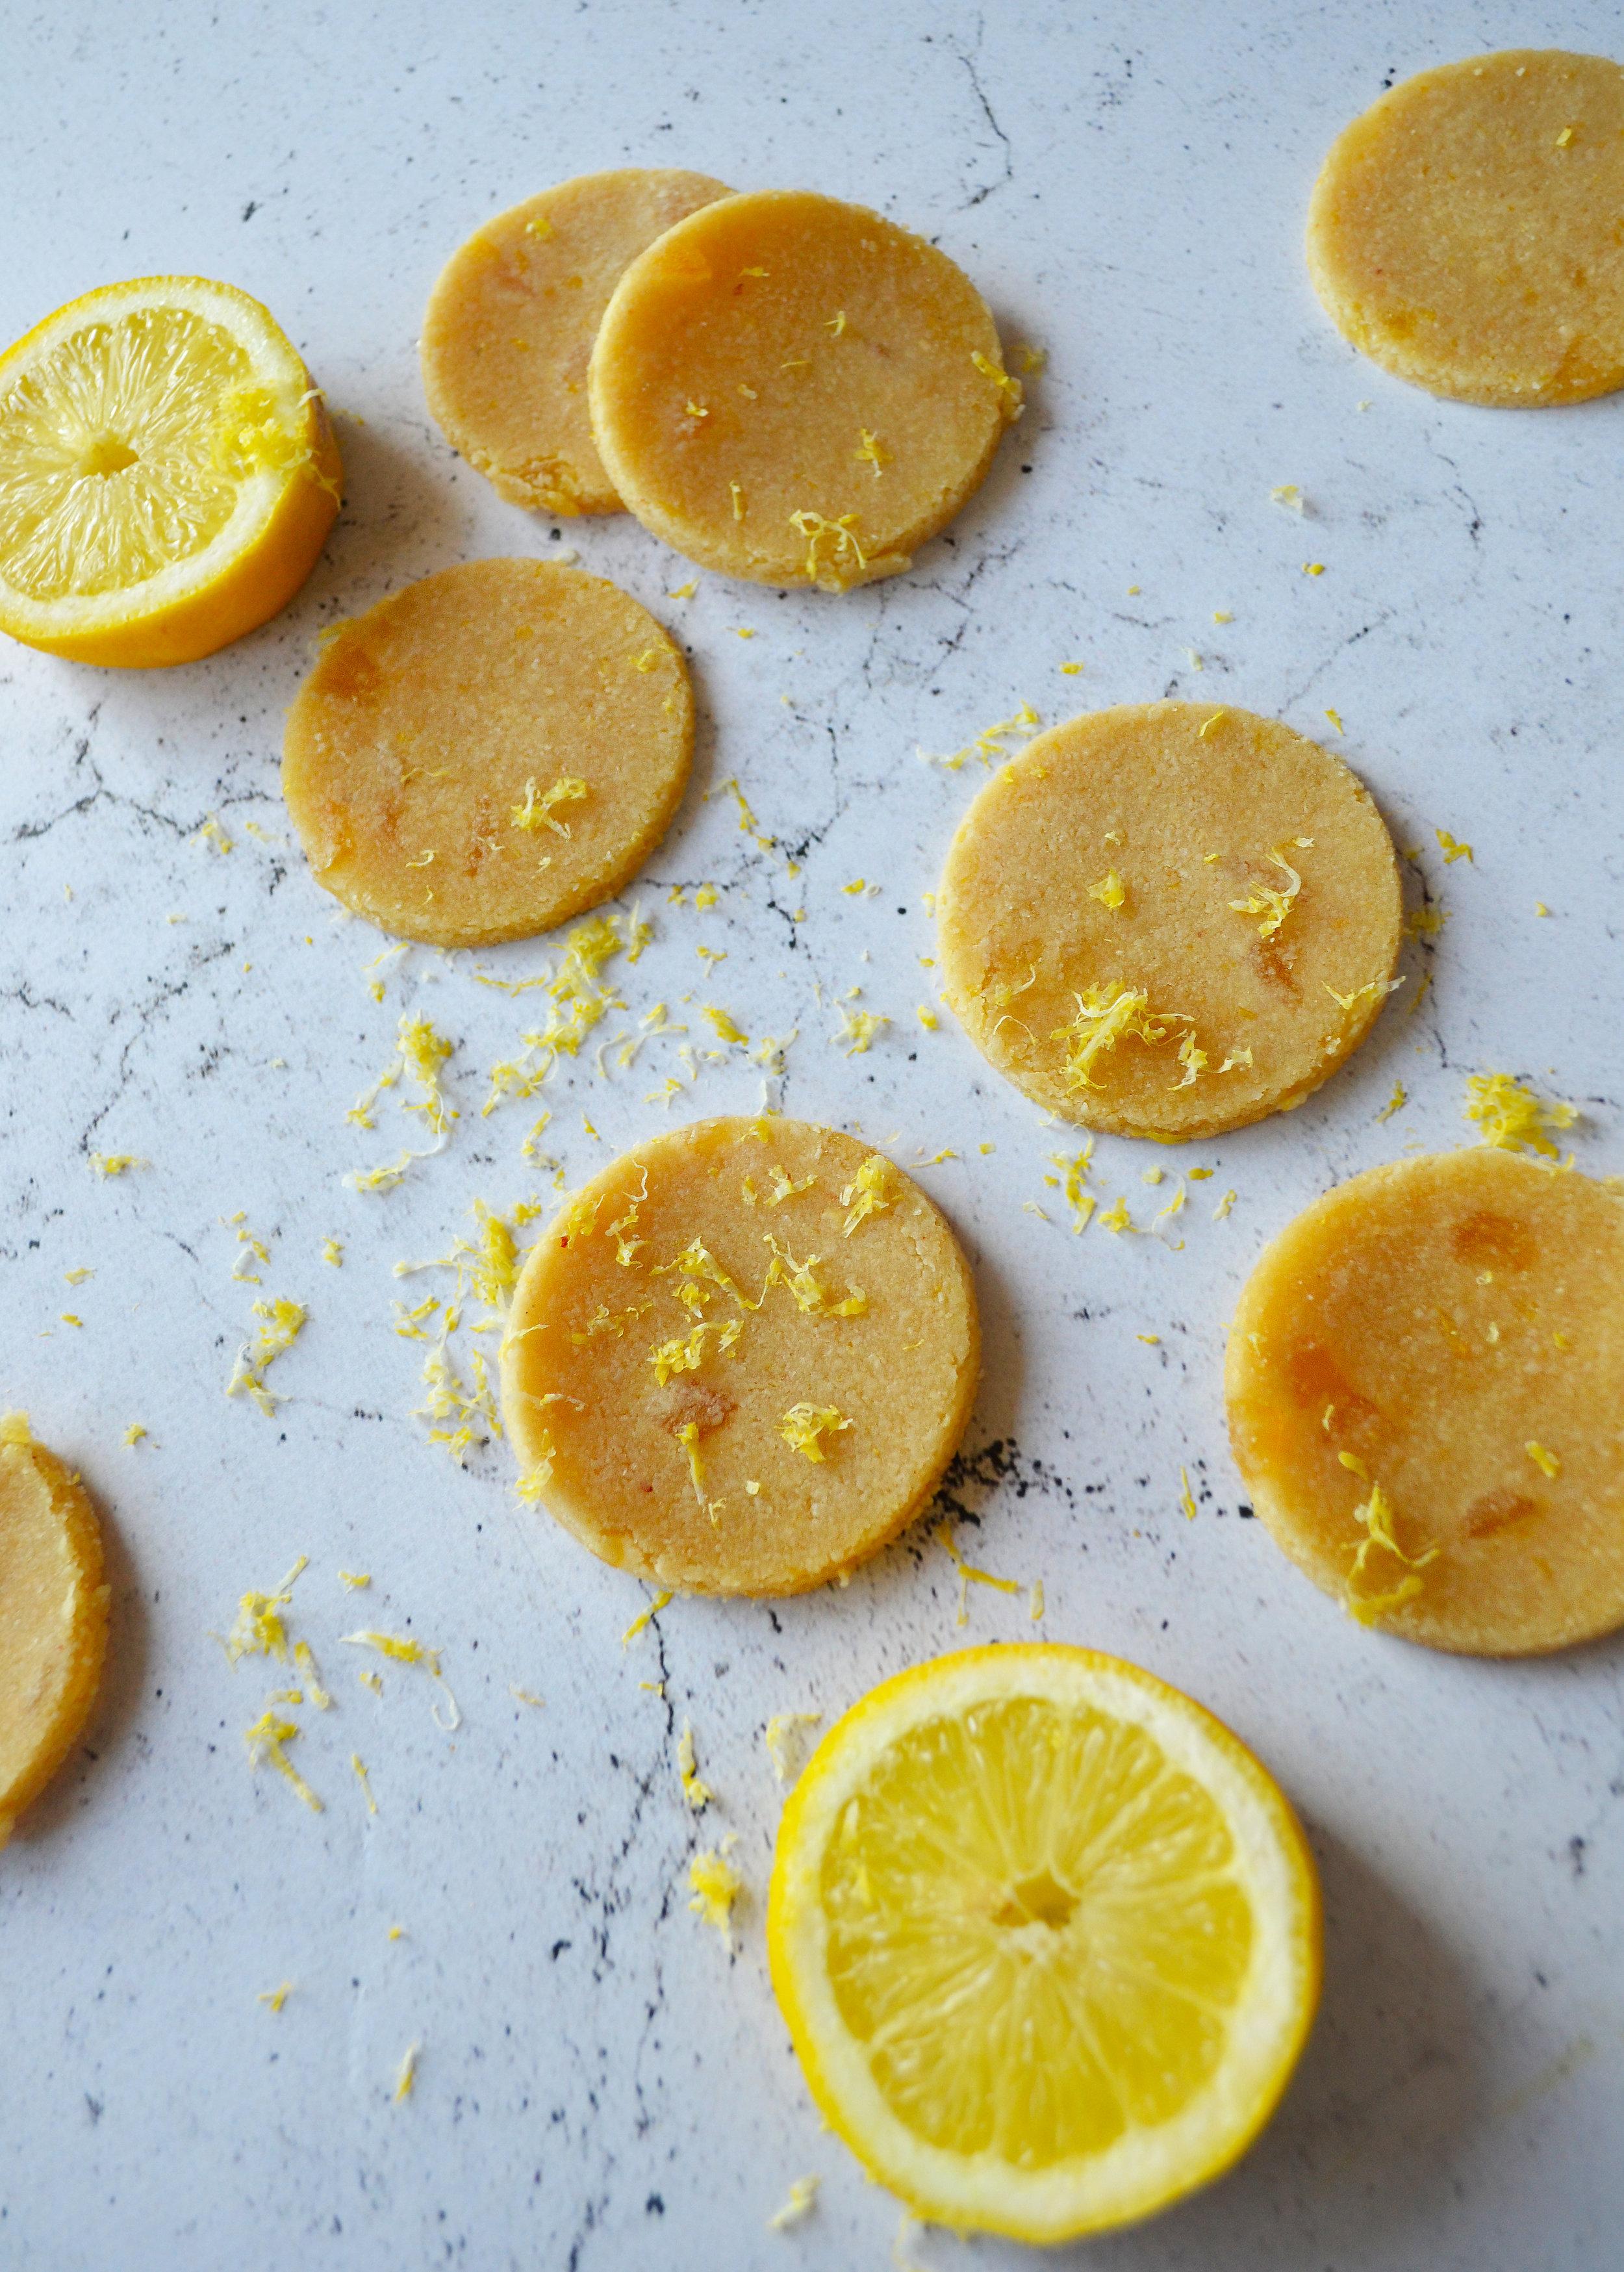 Raw lemon and ginger cookies | The Flourishing Pantry